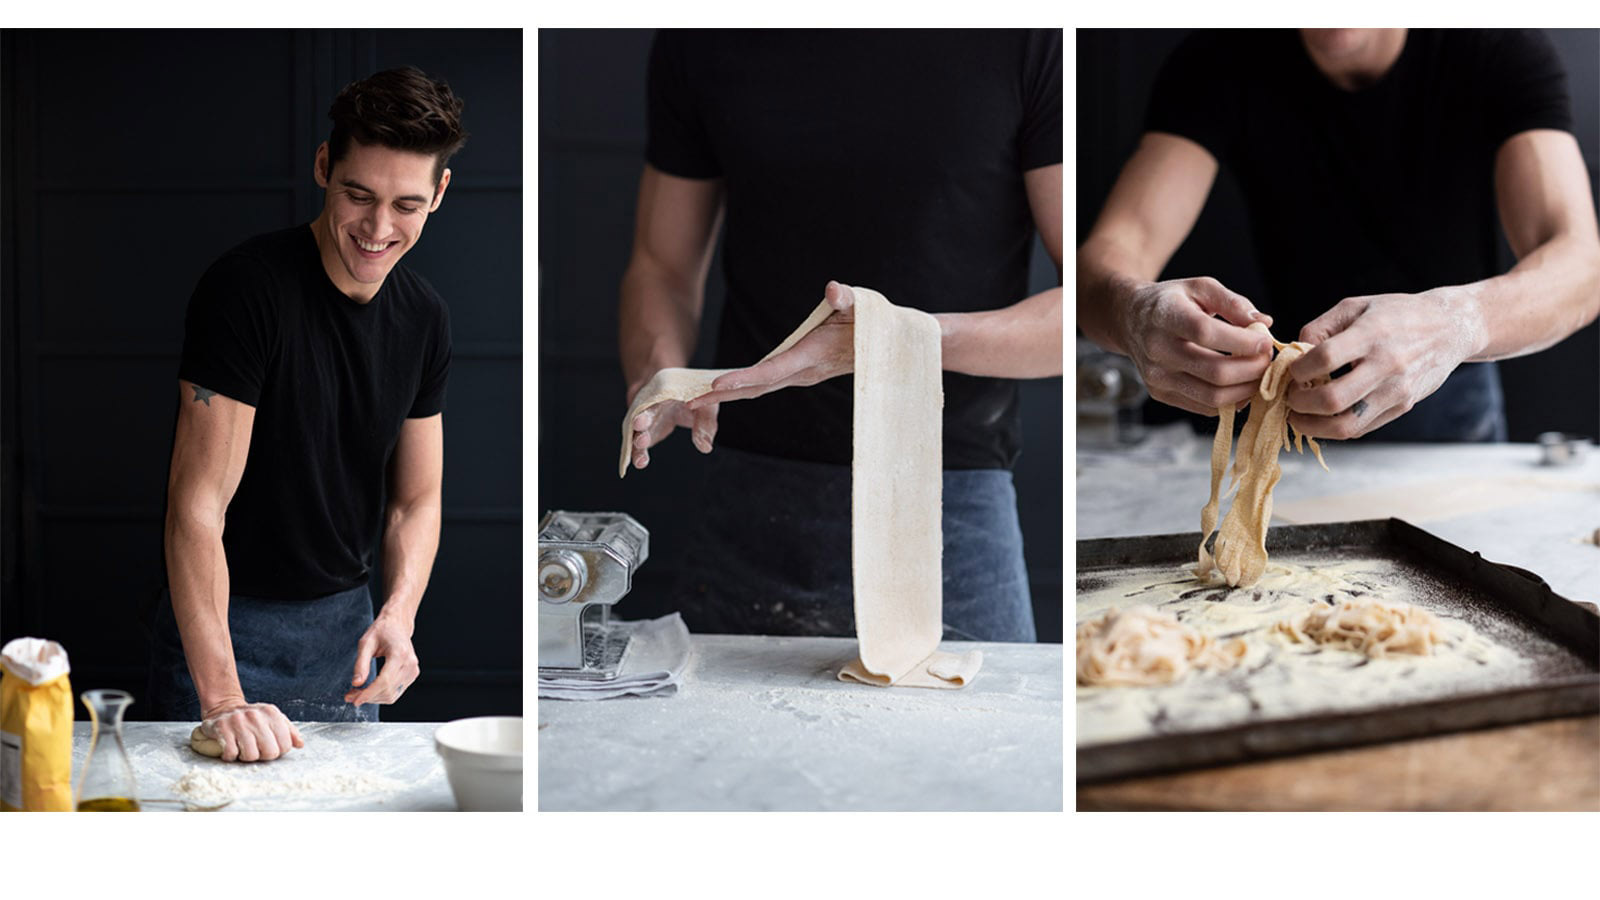 Issac-Carew-making-pasta